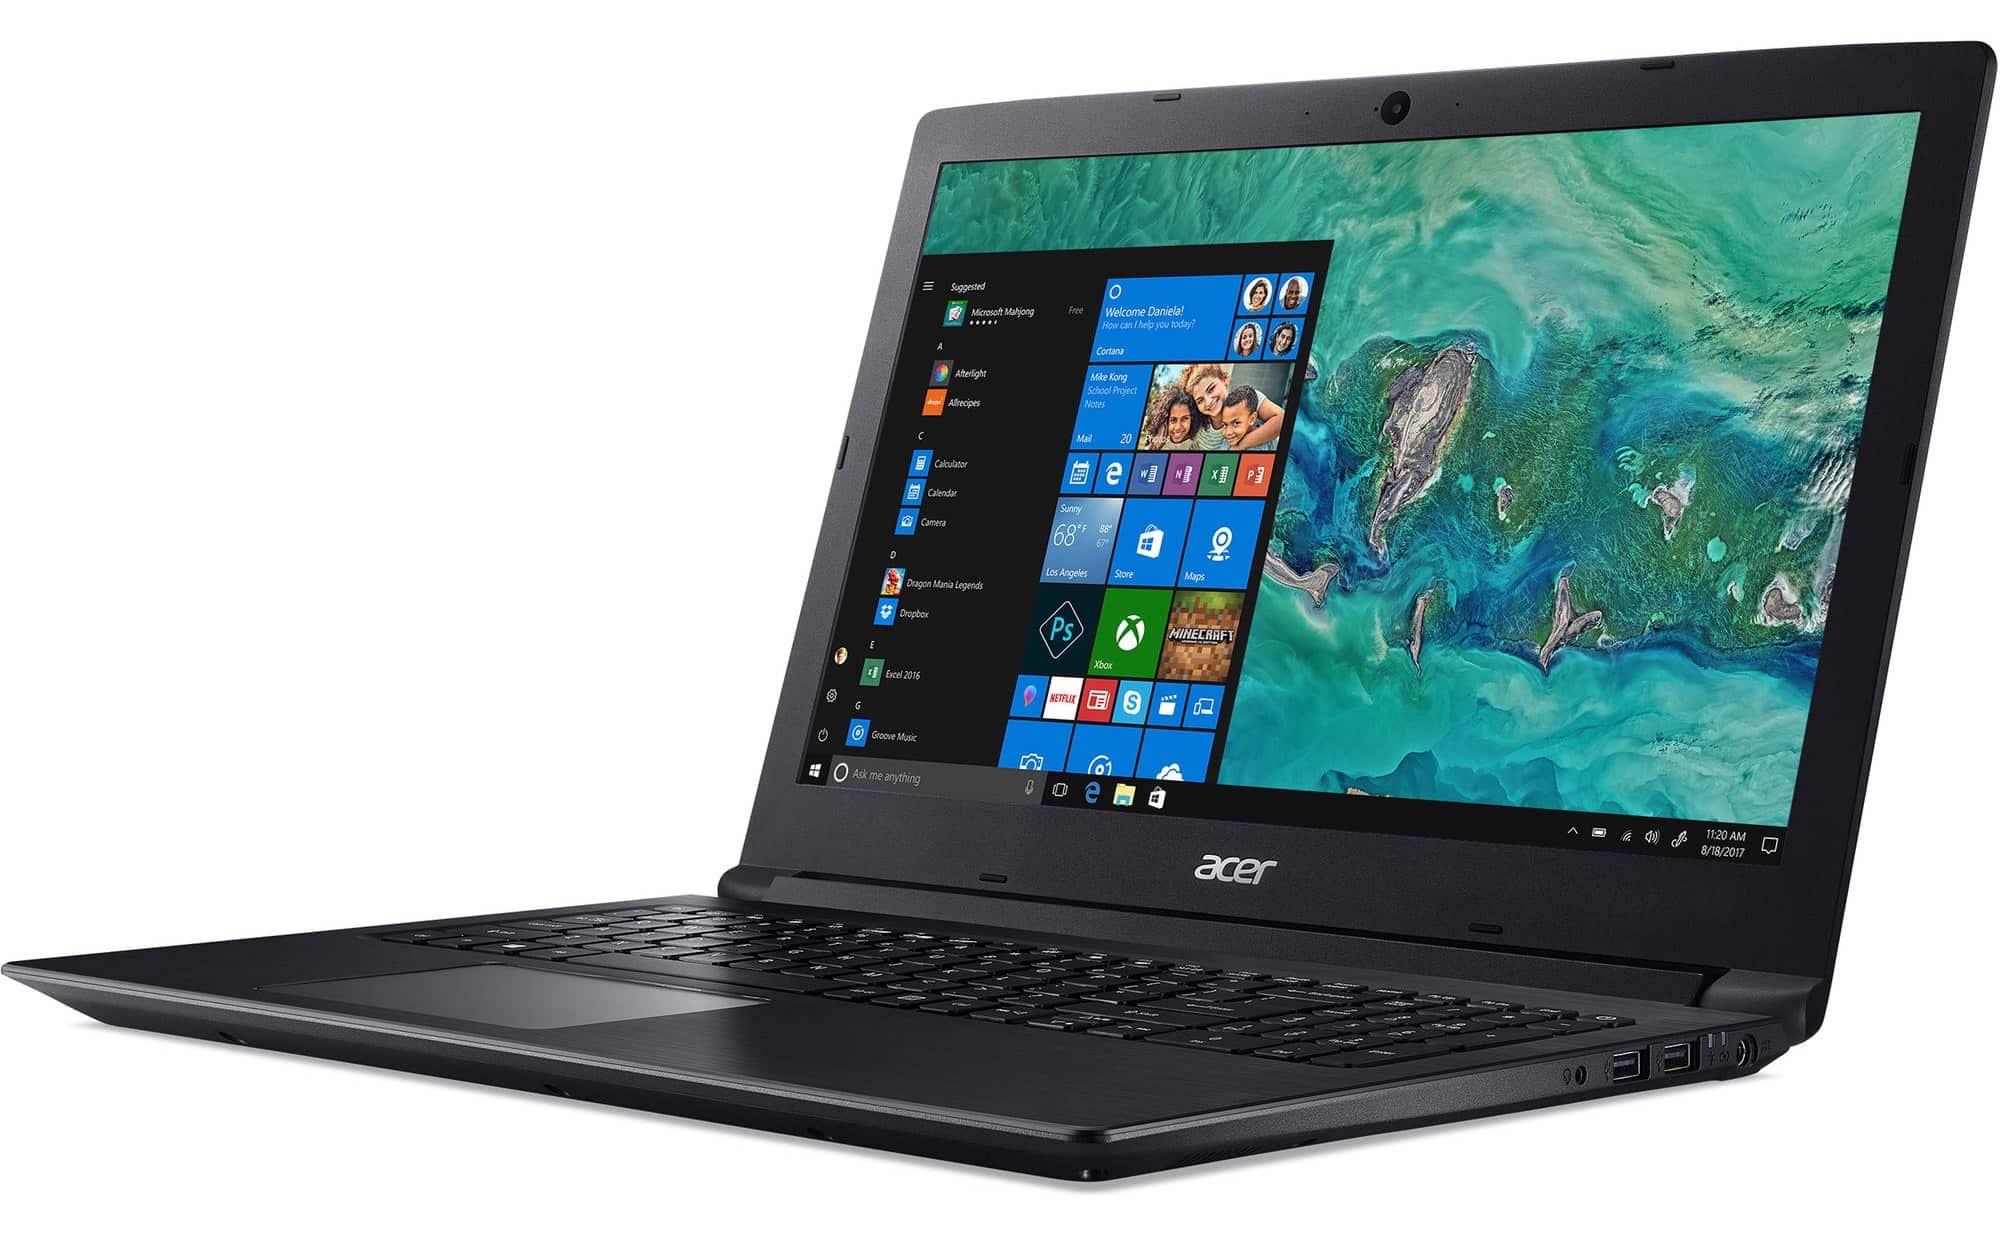 Acer Aspire 3 Series $400 Laptop